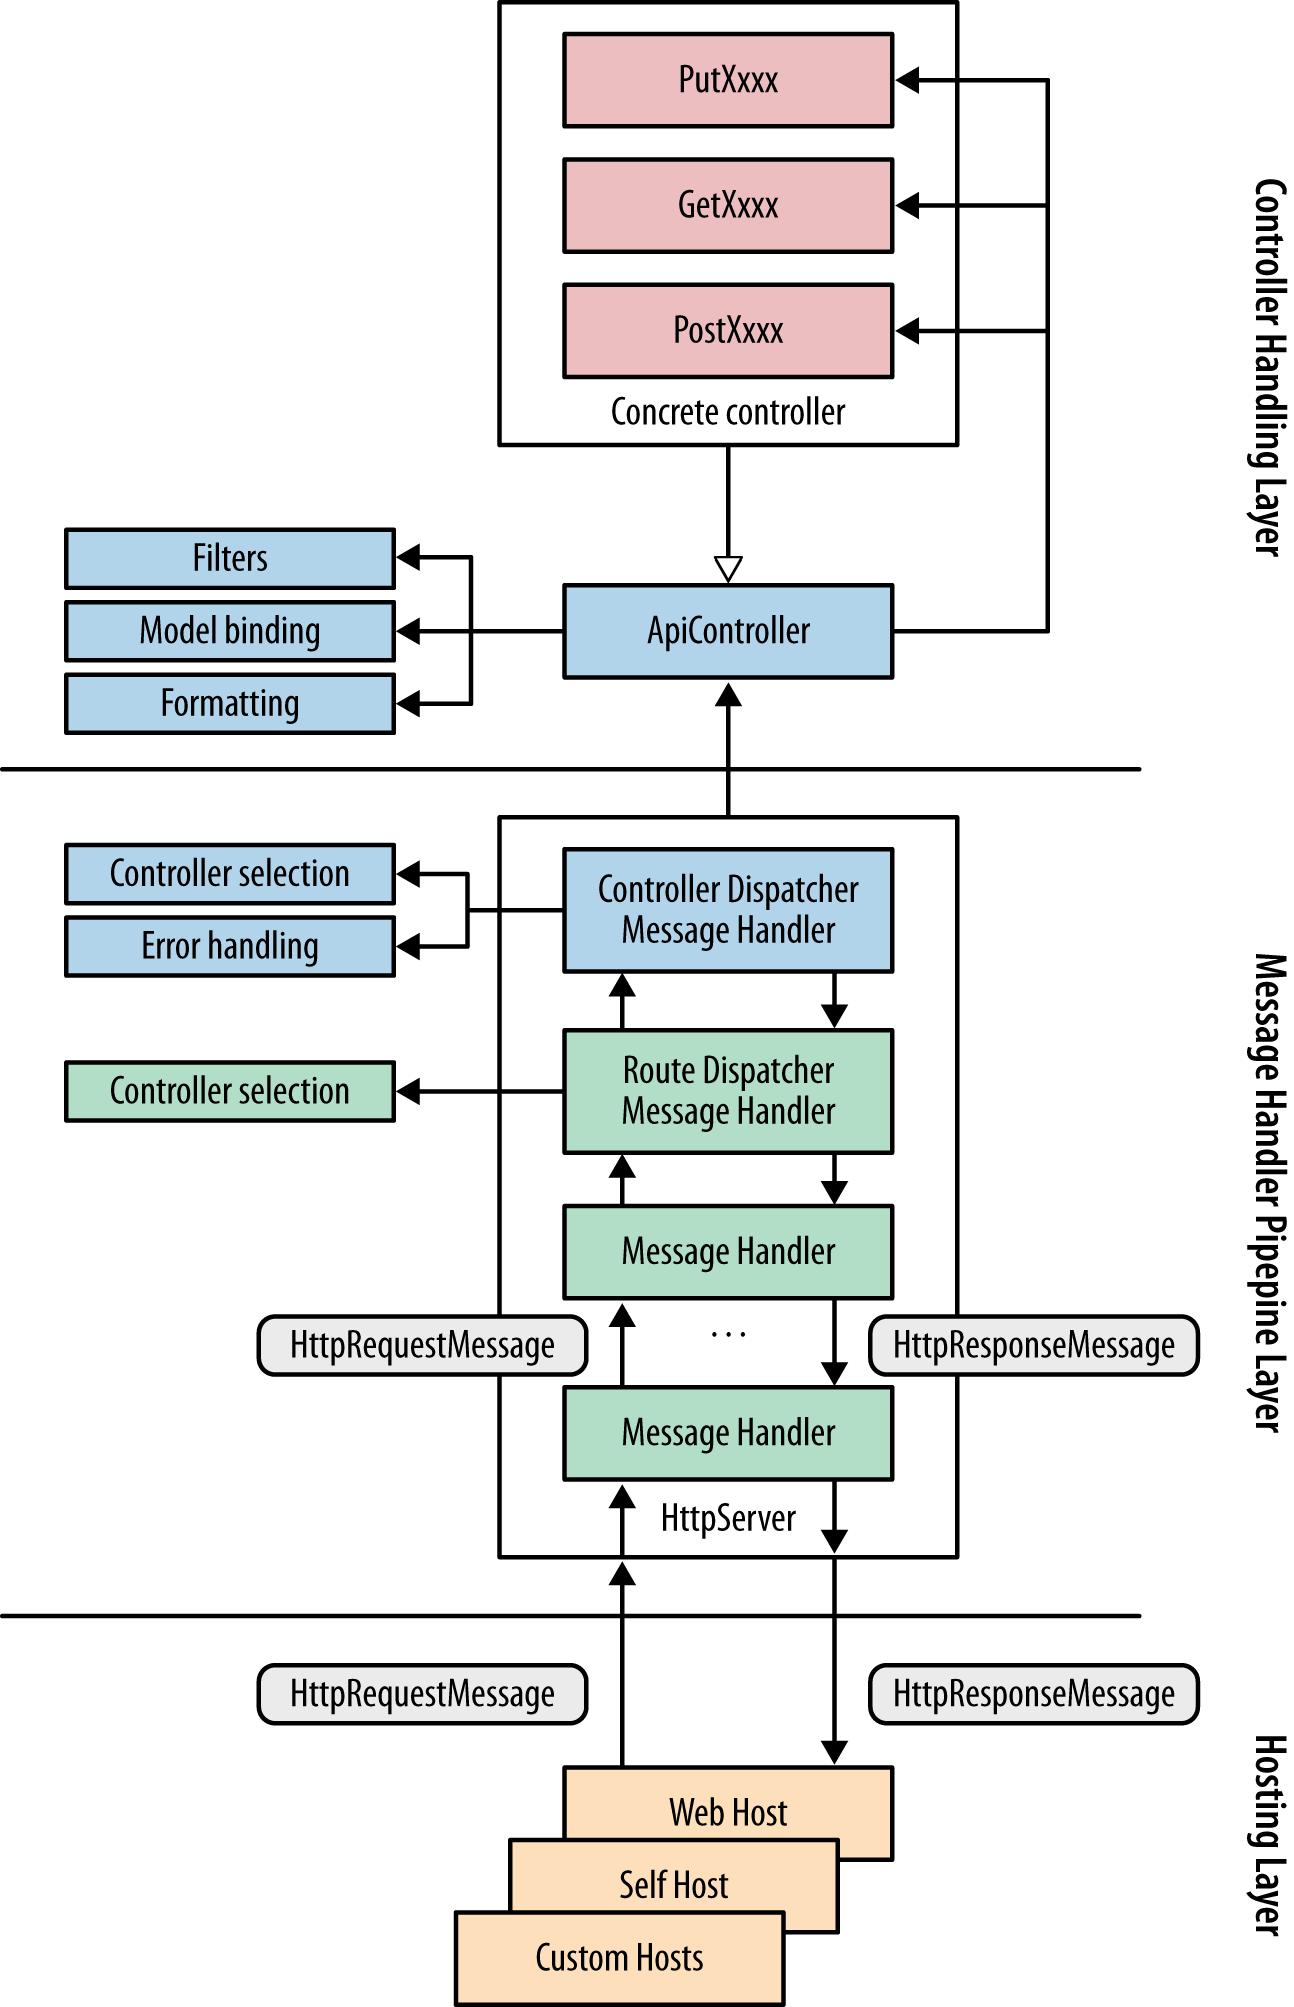 mvc struts architecture diagram lawn mower starter solenoid wiring designing evolvable web apis with asp net